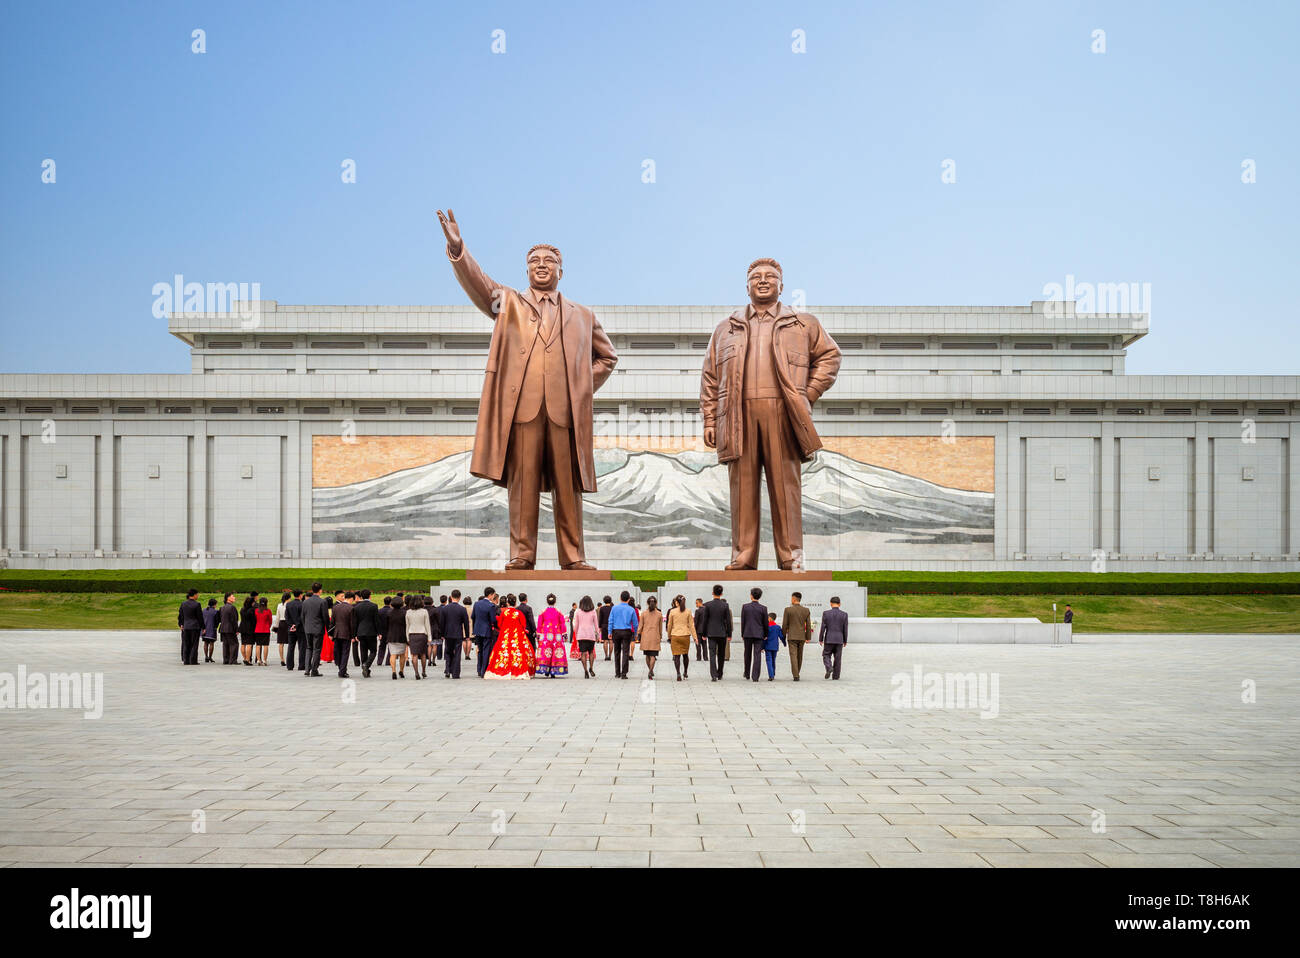 Pyongyang, North Korea - April 29, 2019: Kim Il Sung and Kim Jong Il statues in Mansudae, pyongyang. - Stock Image